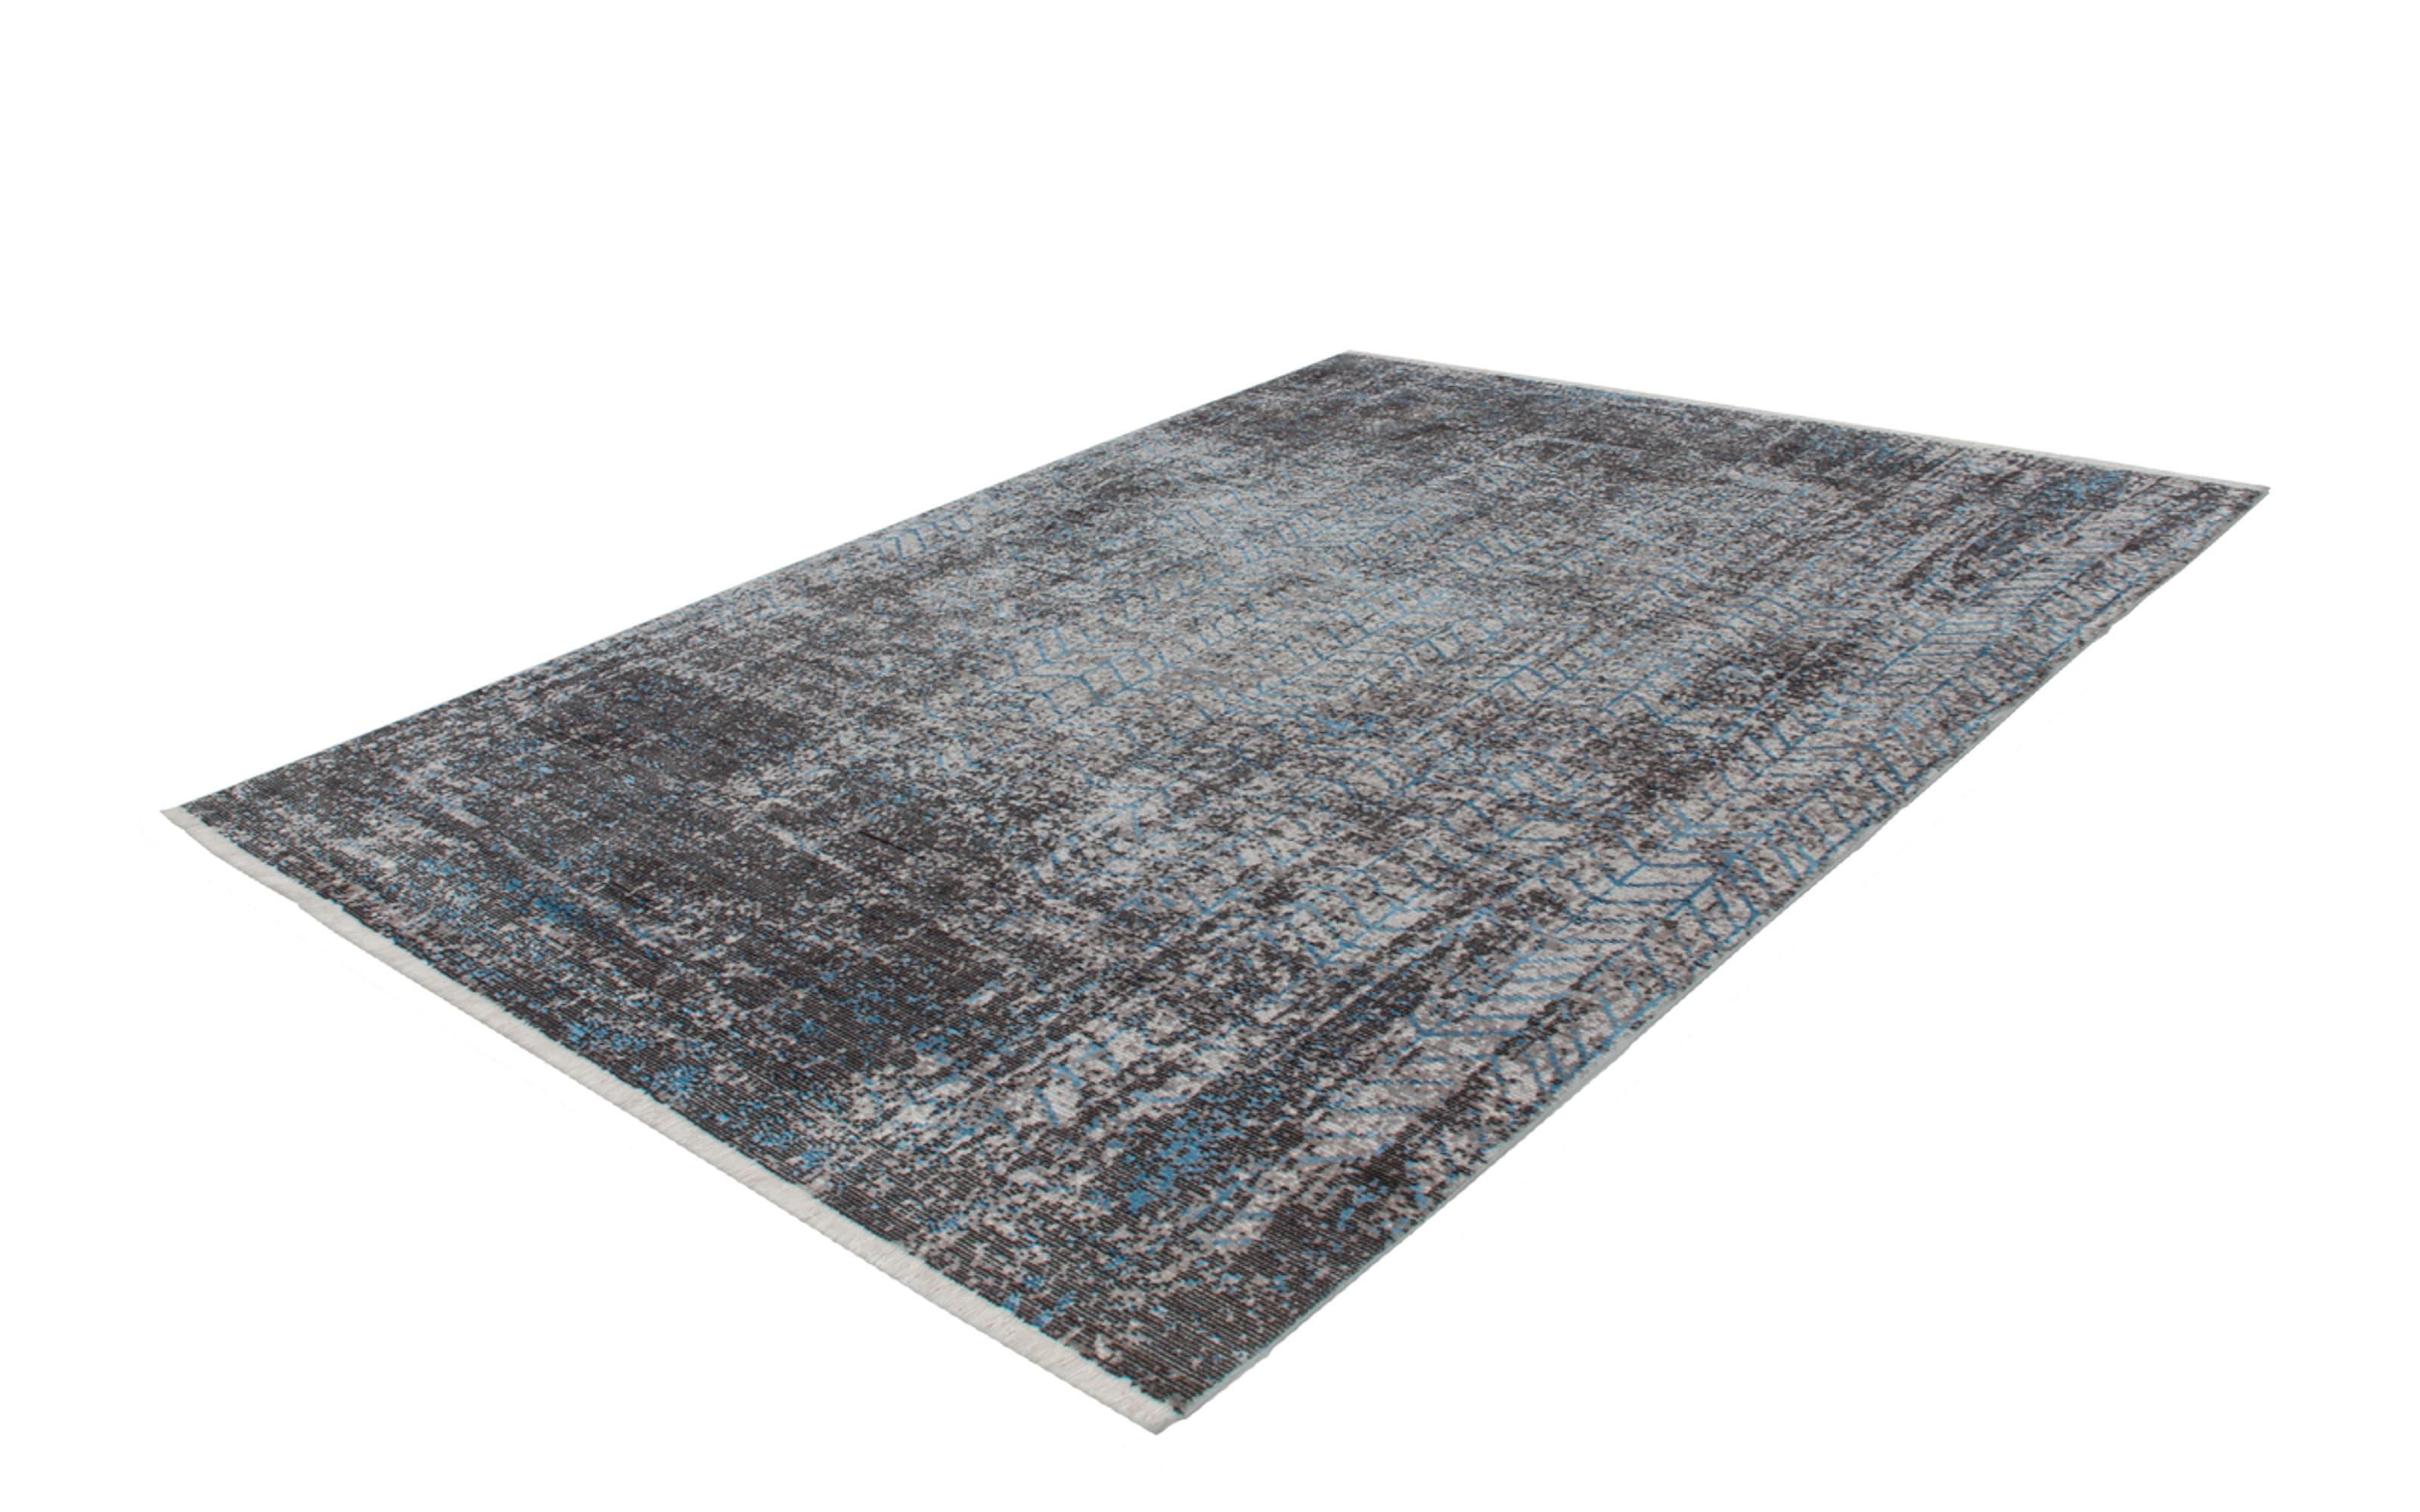 Teppich Antigua 300 in grau-türkis, 80 x 150 cm